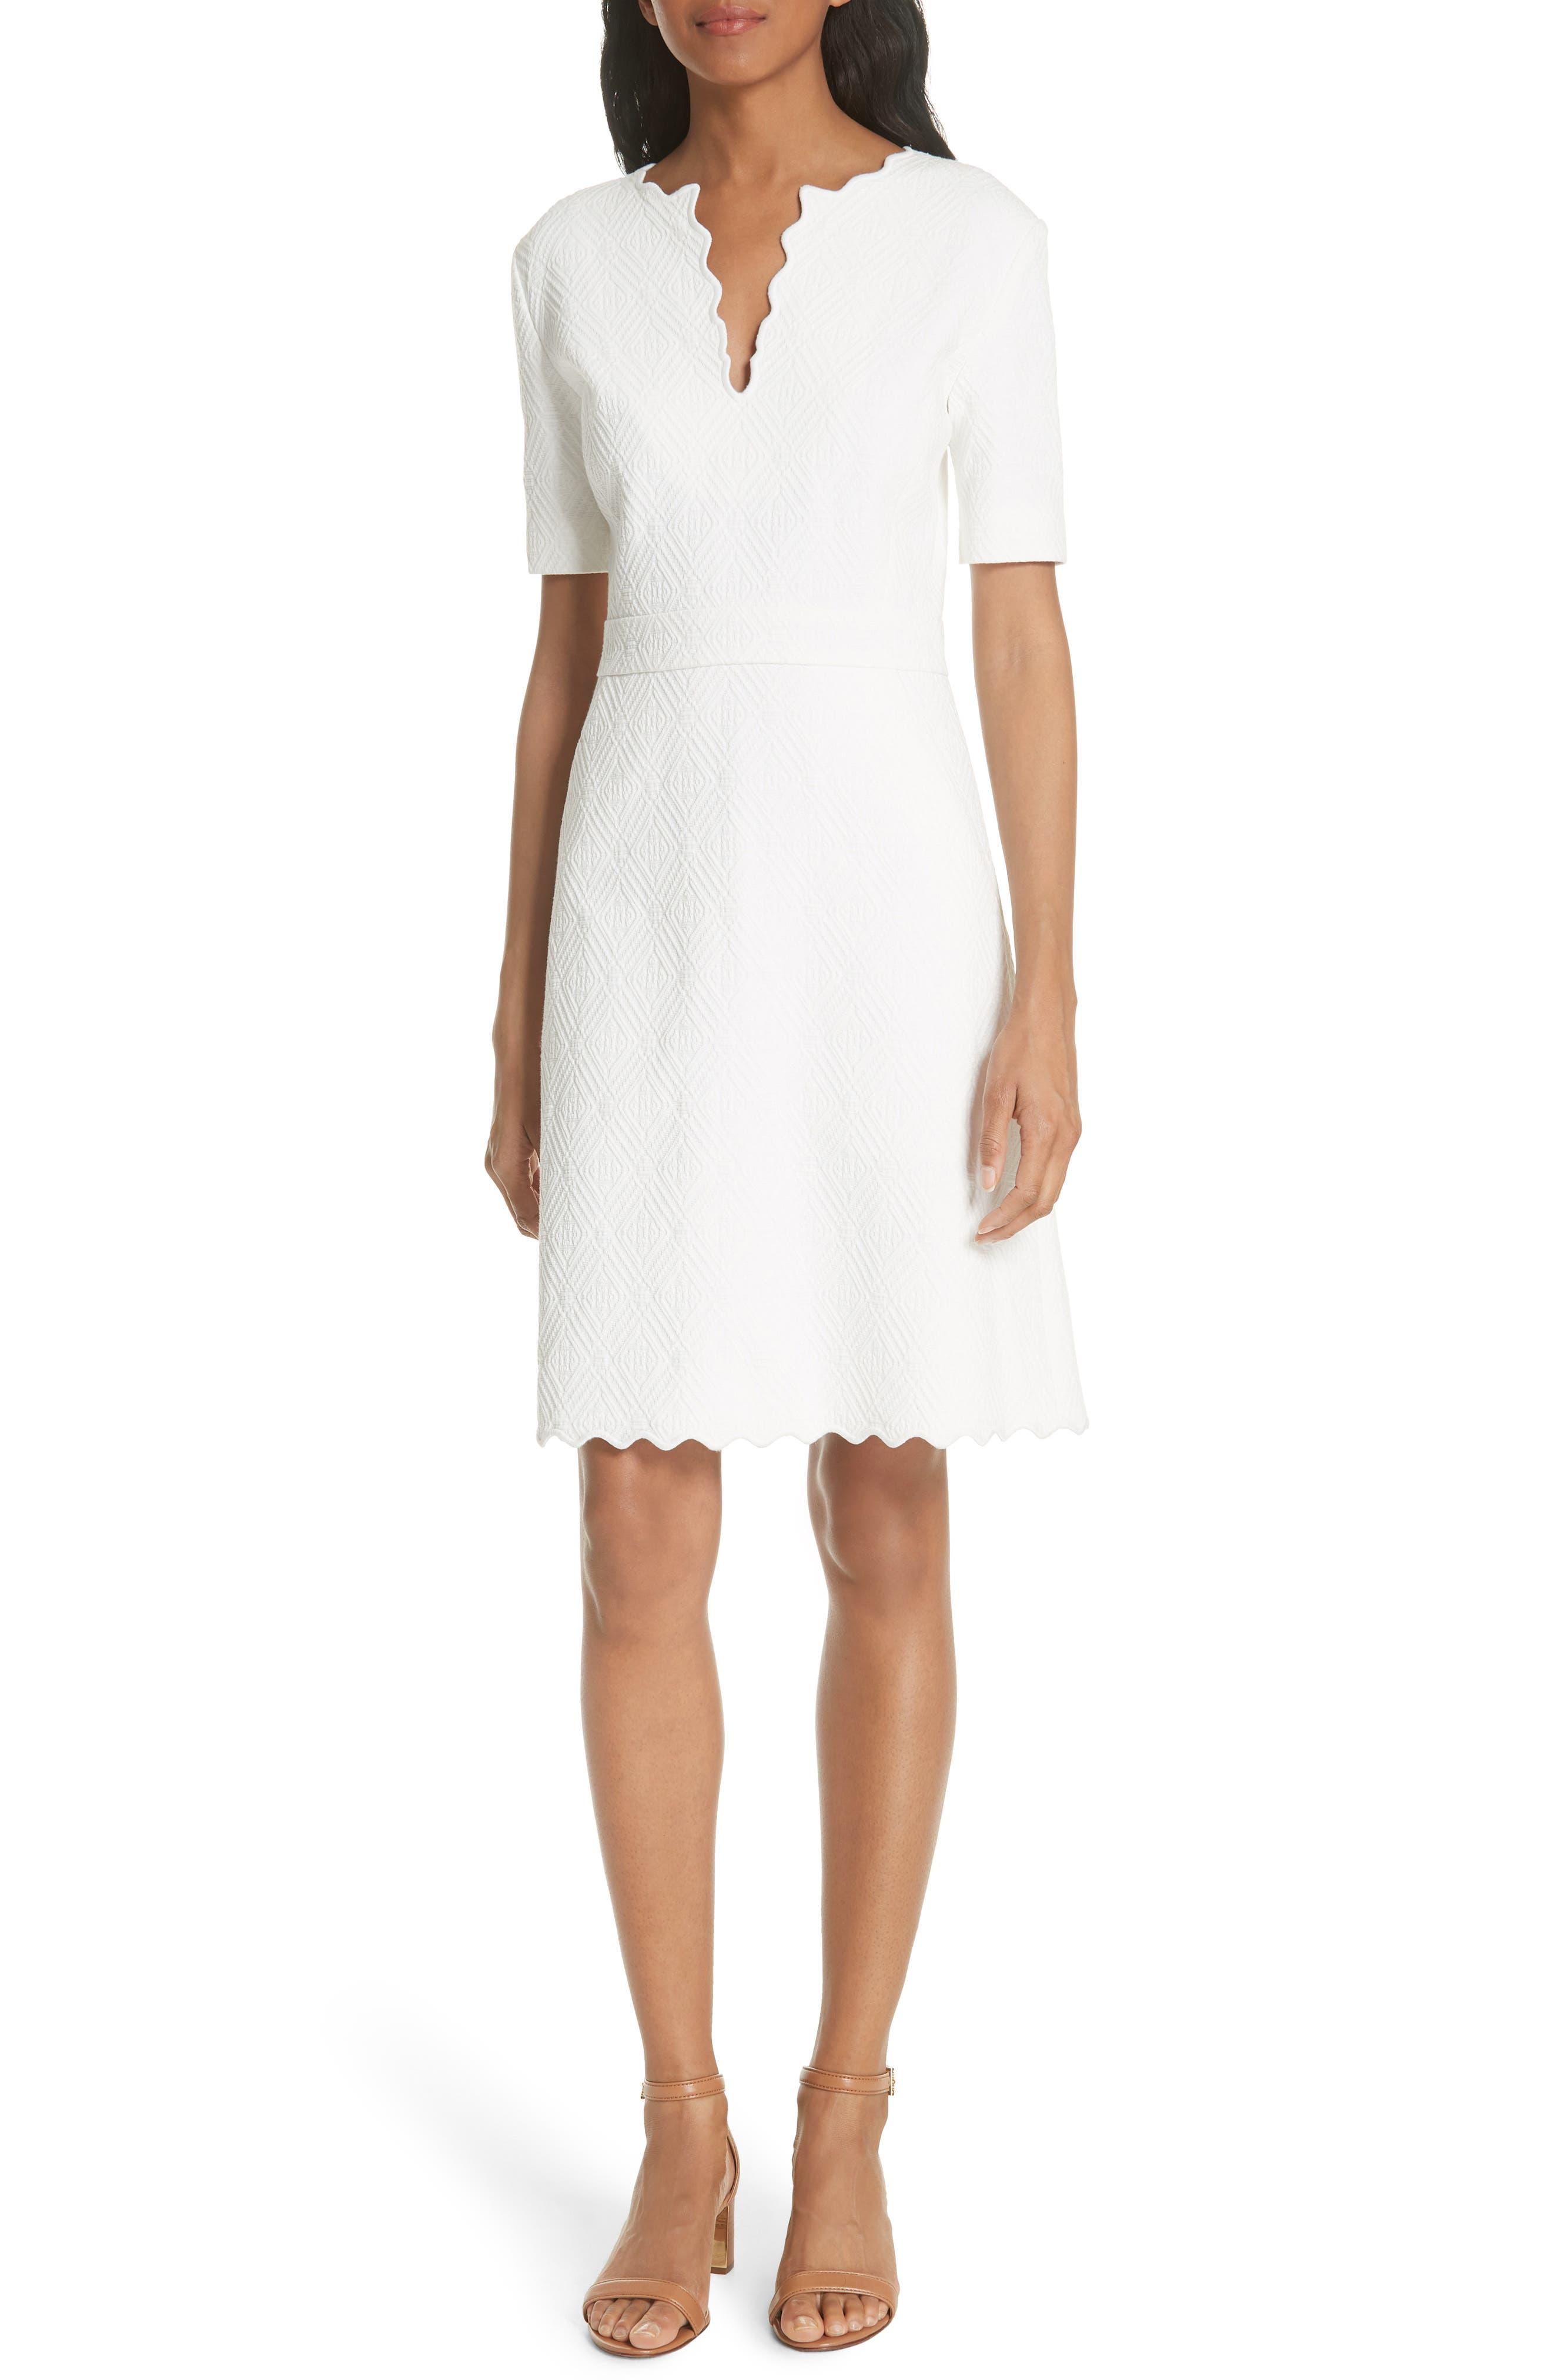 Tory Burch Bailey Scallop Cotton Dress